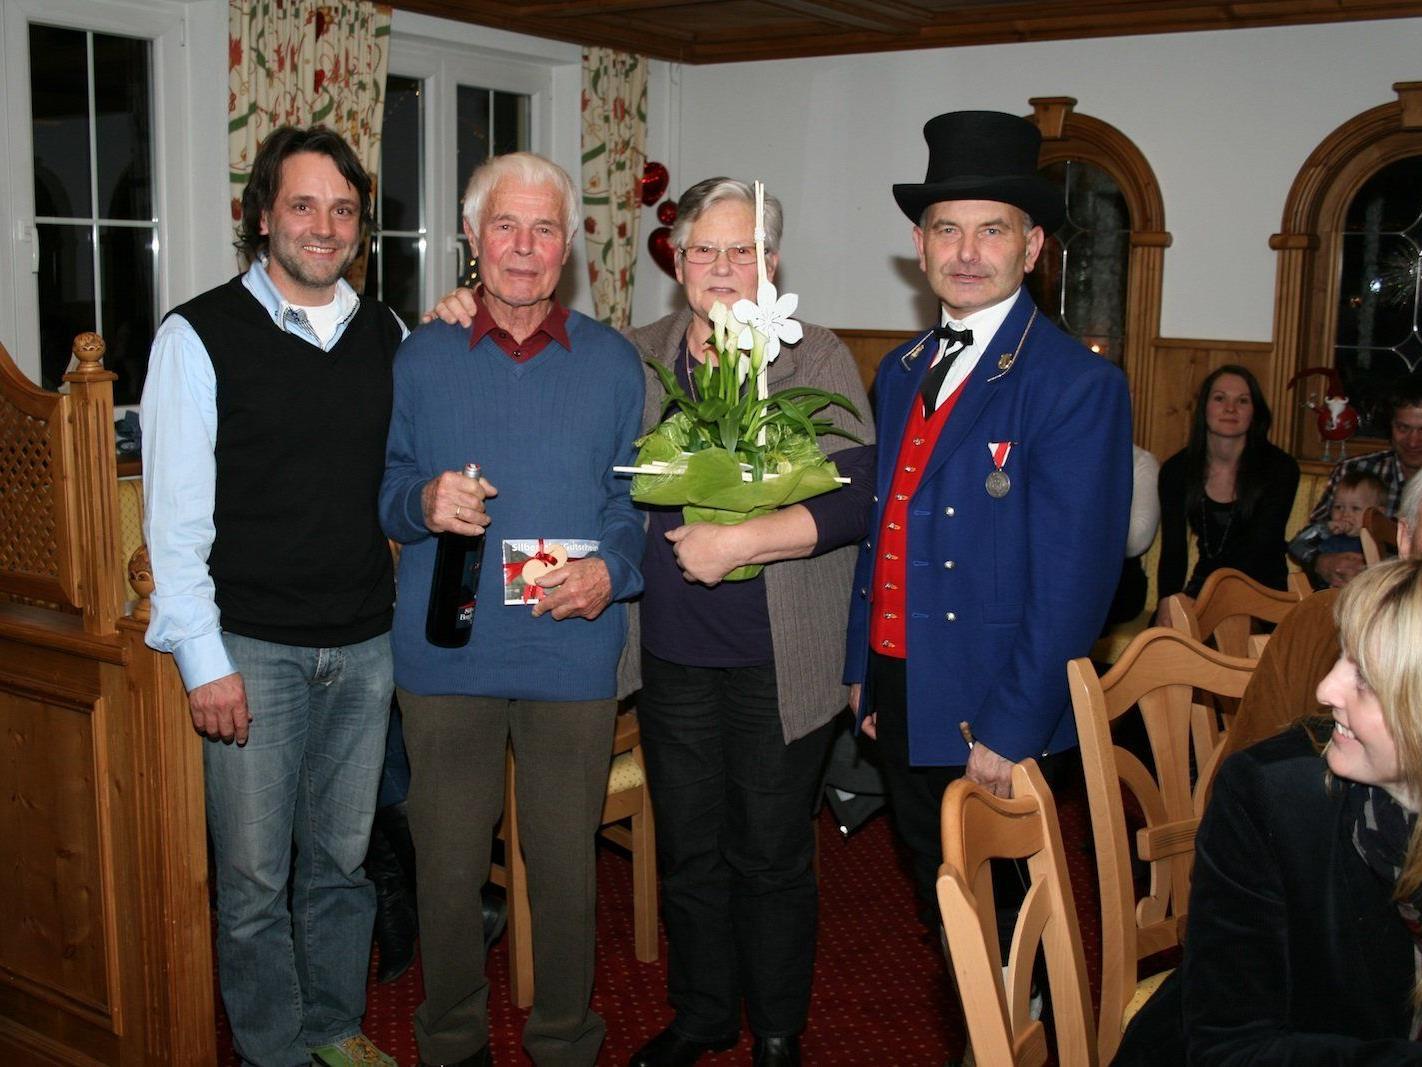 Bürgermeister Thomas Zudrell, Jubilar Gustl Loretz mit Hilda sowie Kapellmeister Alfons Melmer